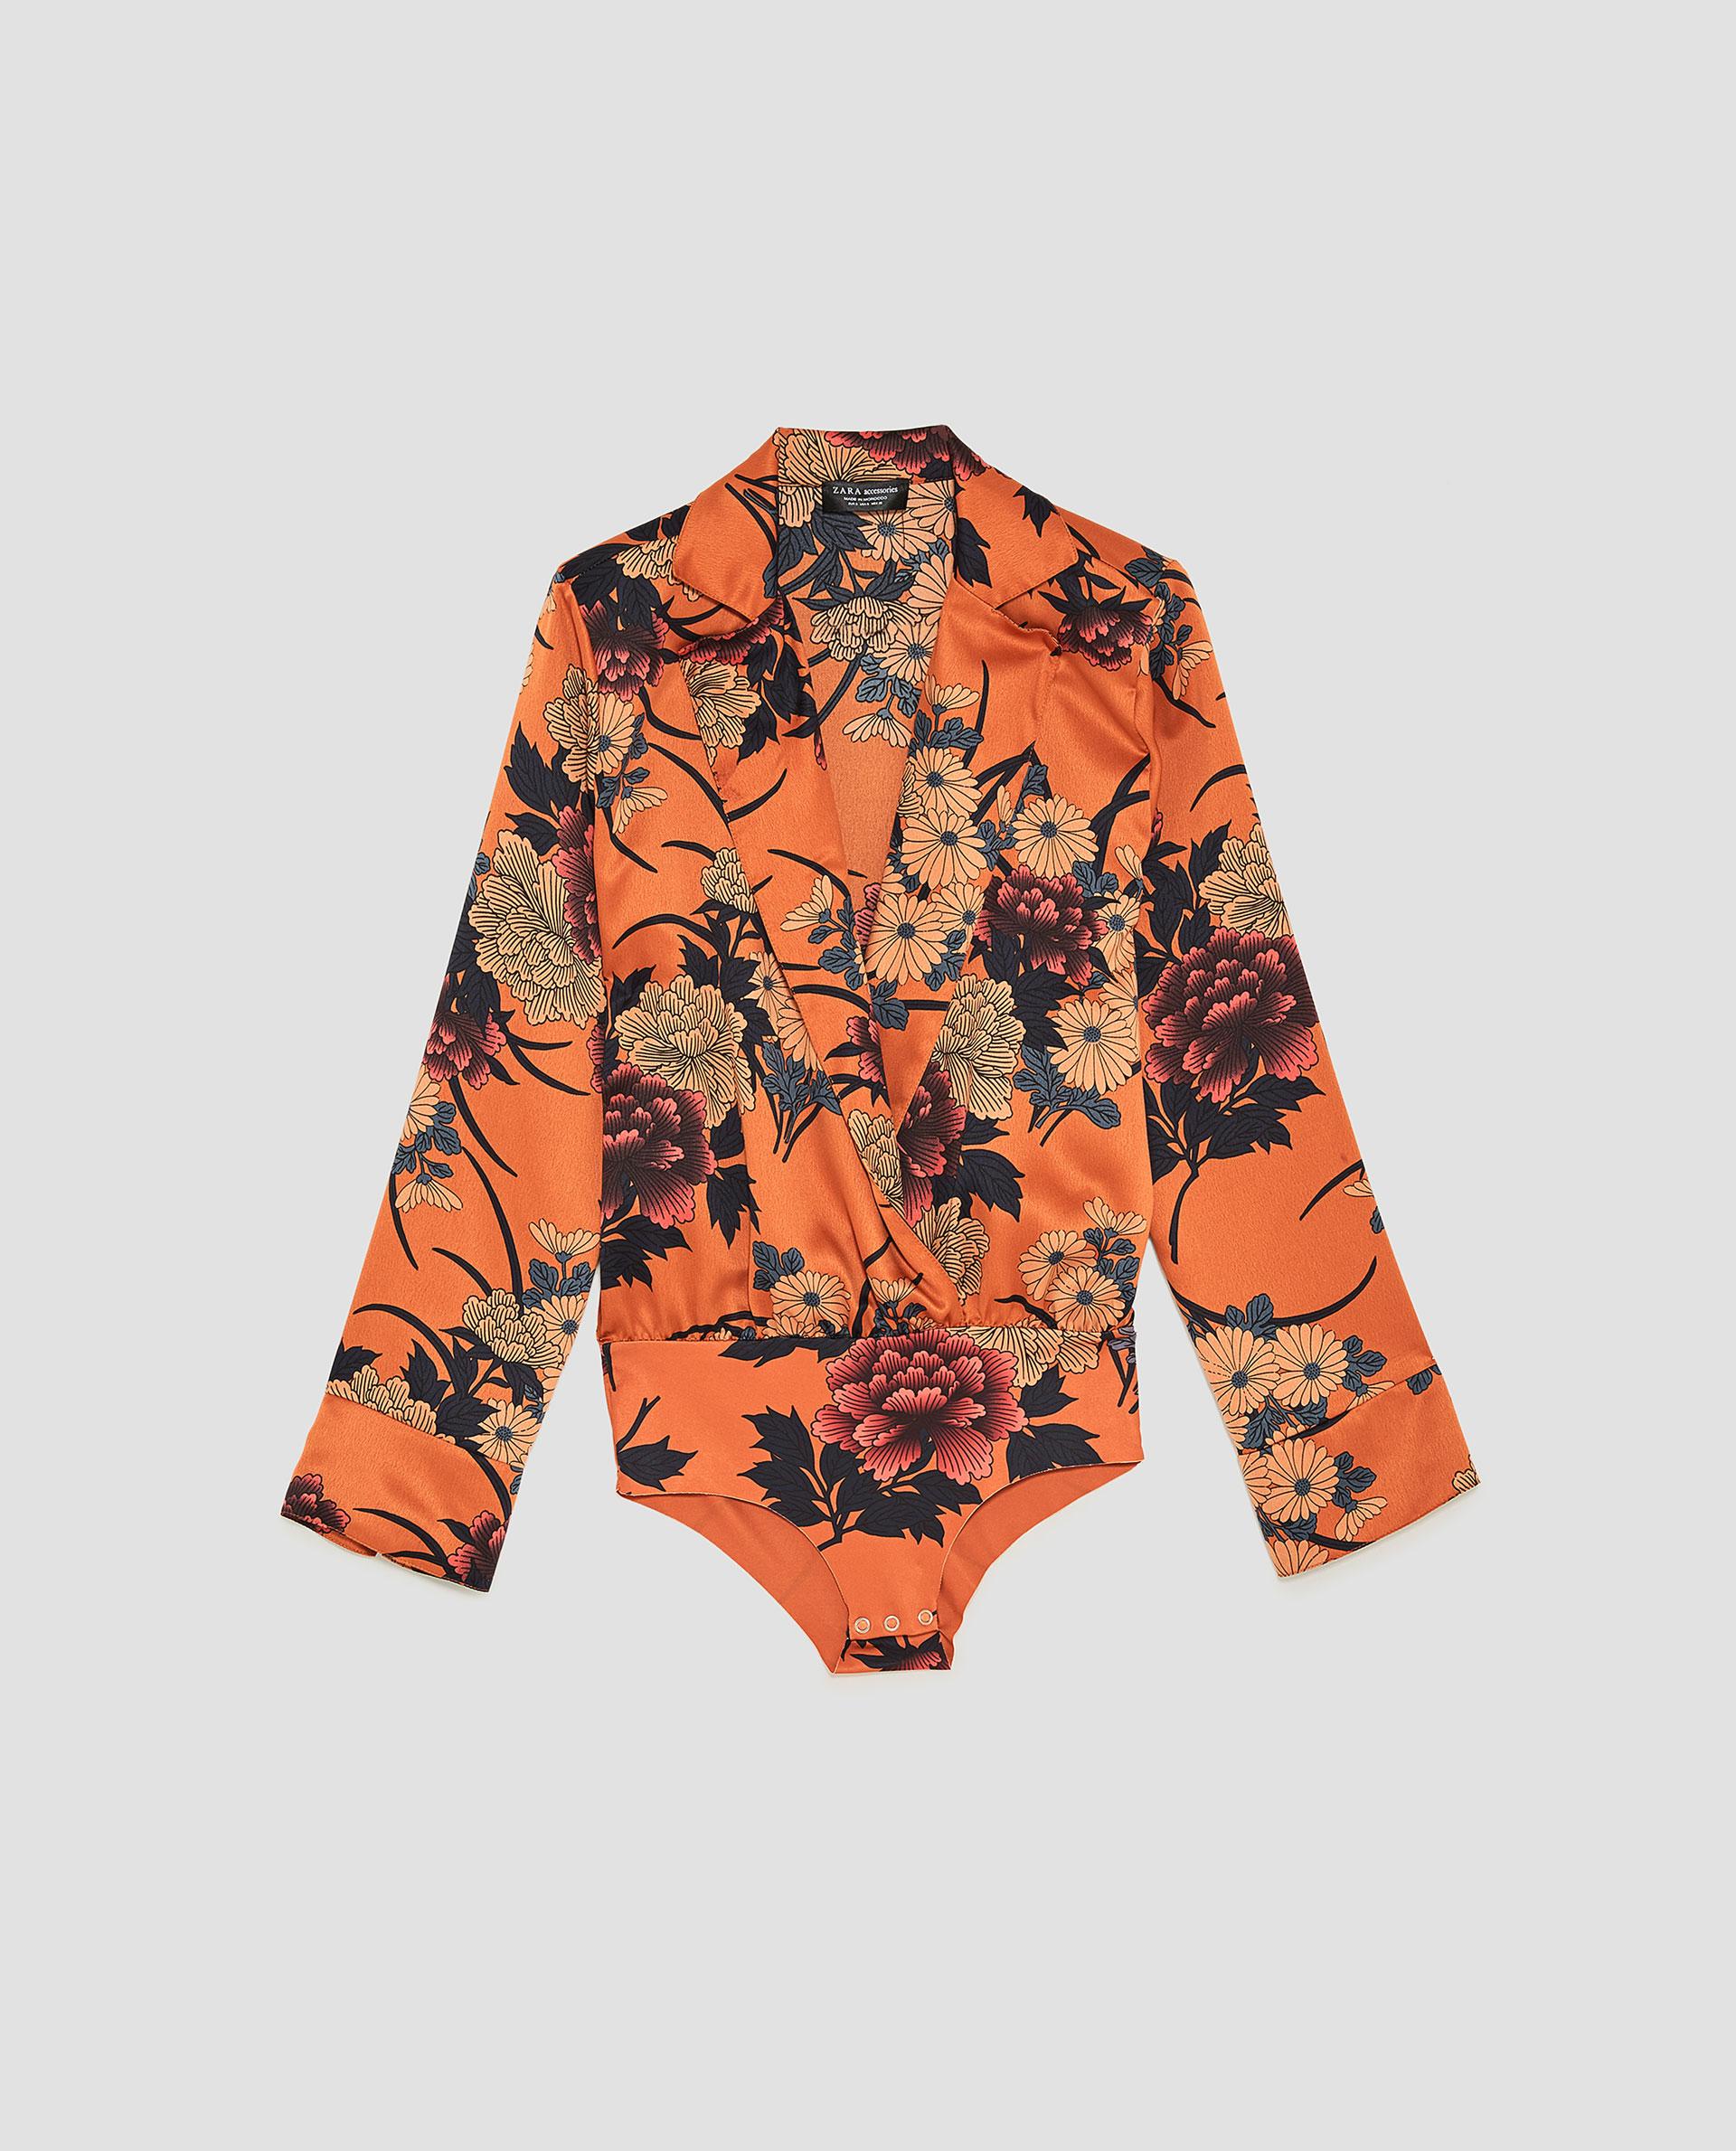 a bodysuit under the asian influence  Printed Sateen Bodysuit / $50 / Zara